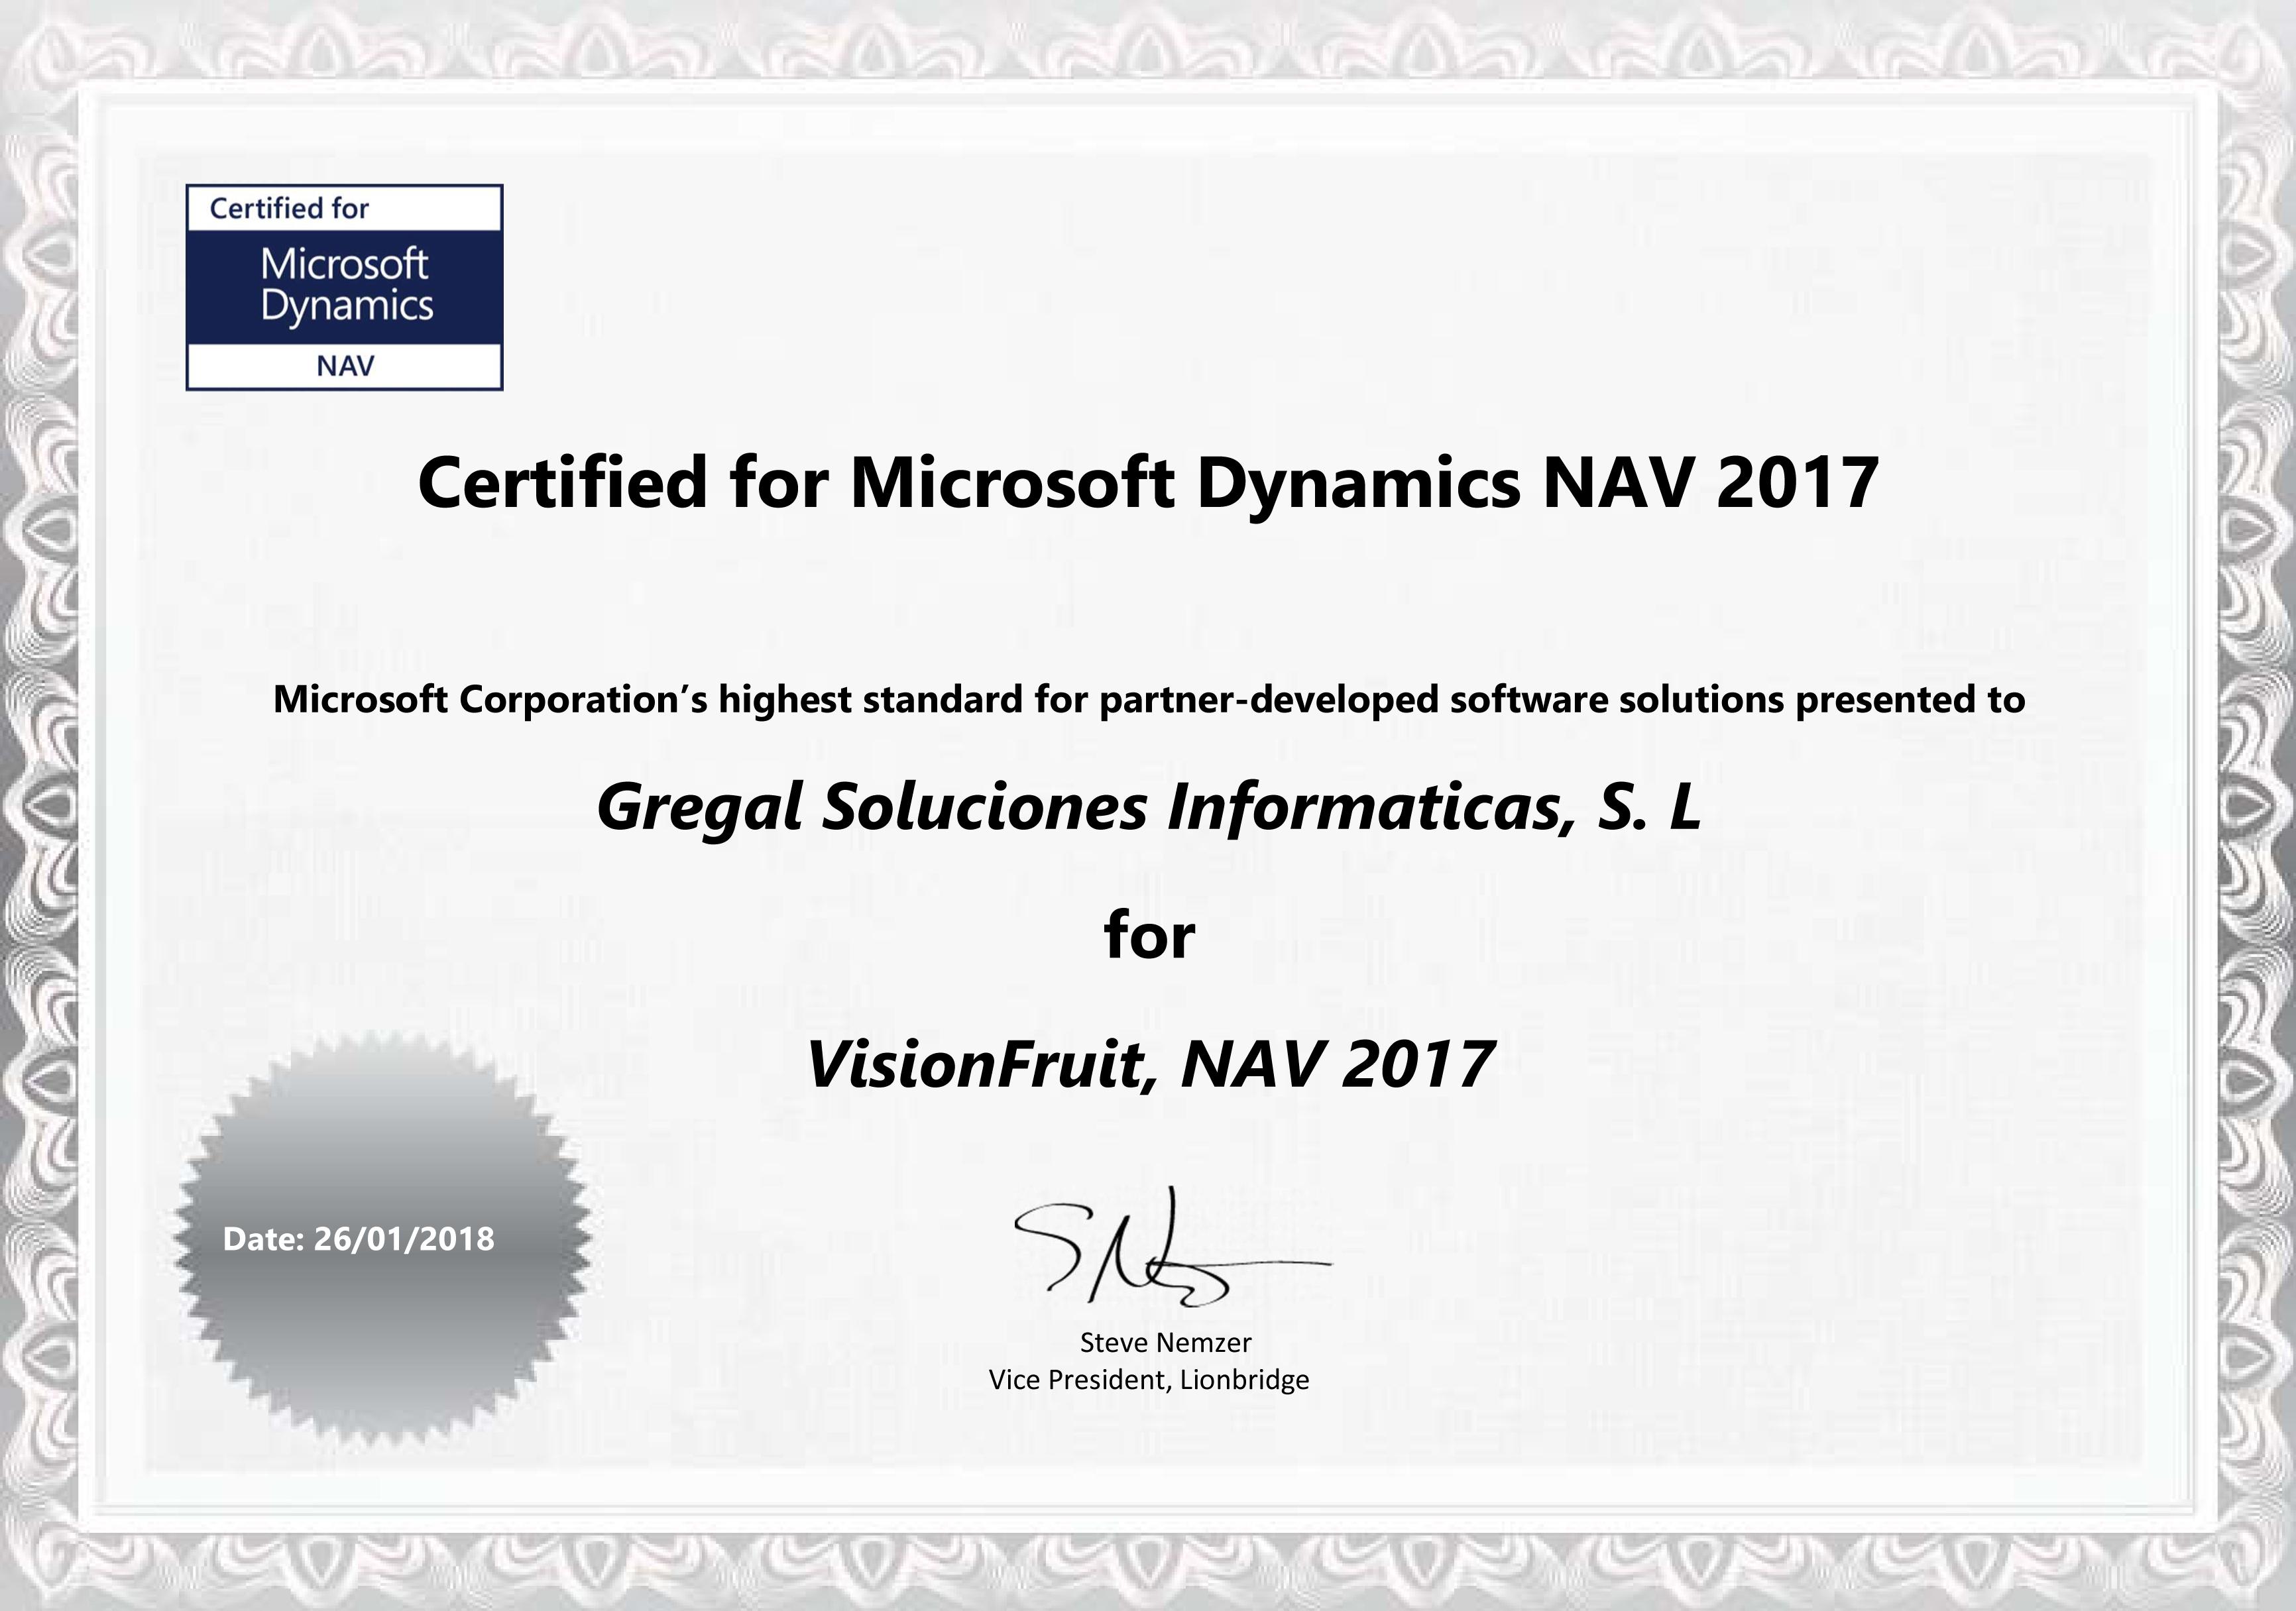 Microsoft Word - New Logo CfMD Certificate Template NAV - Gregal